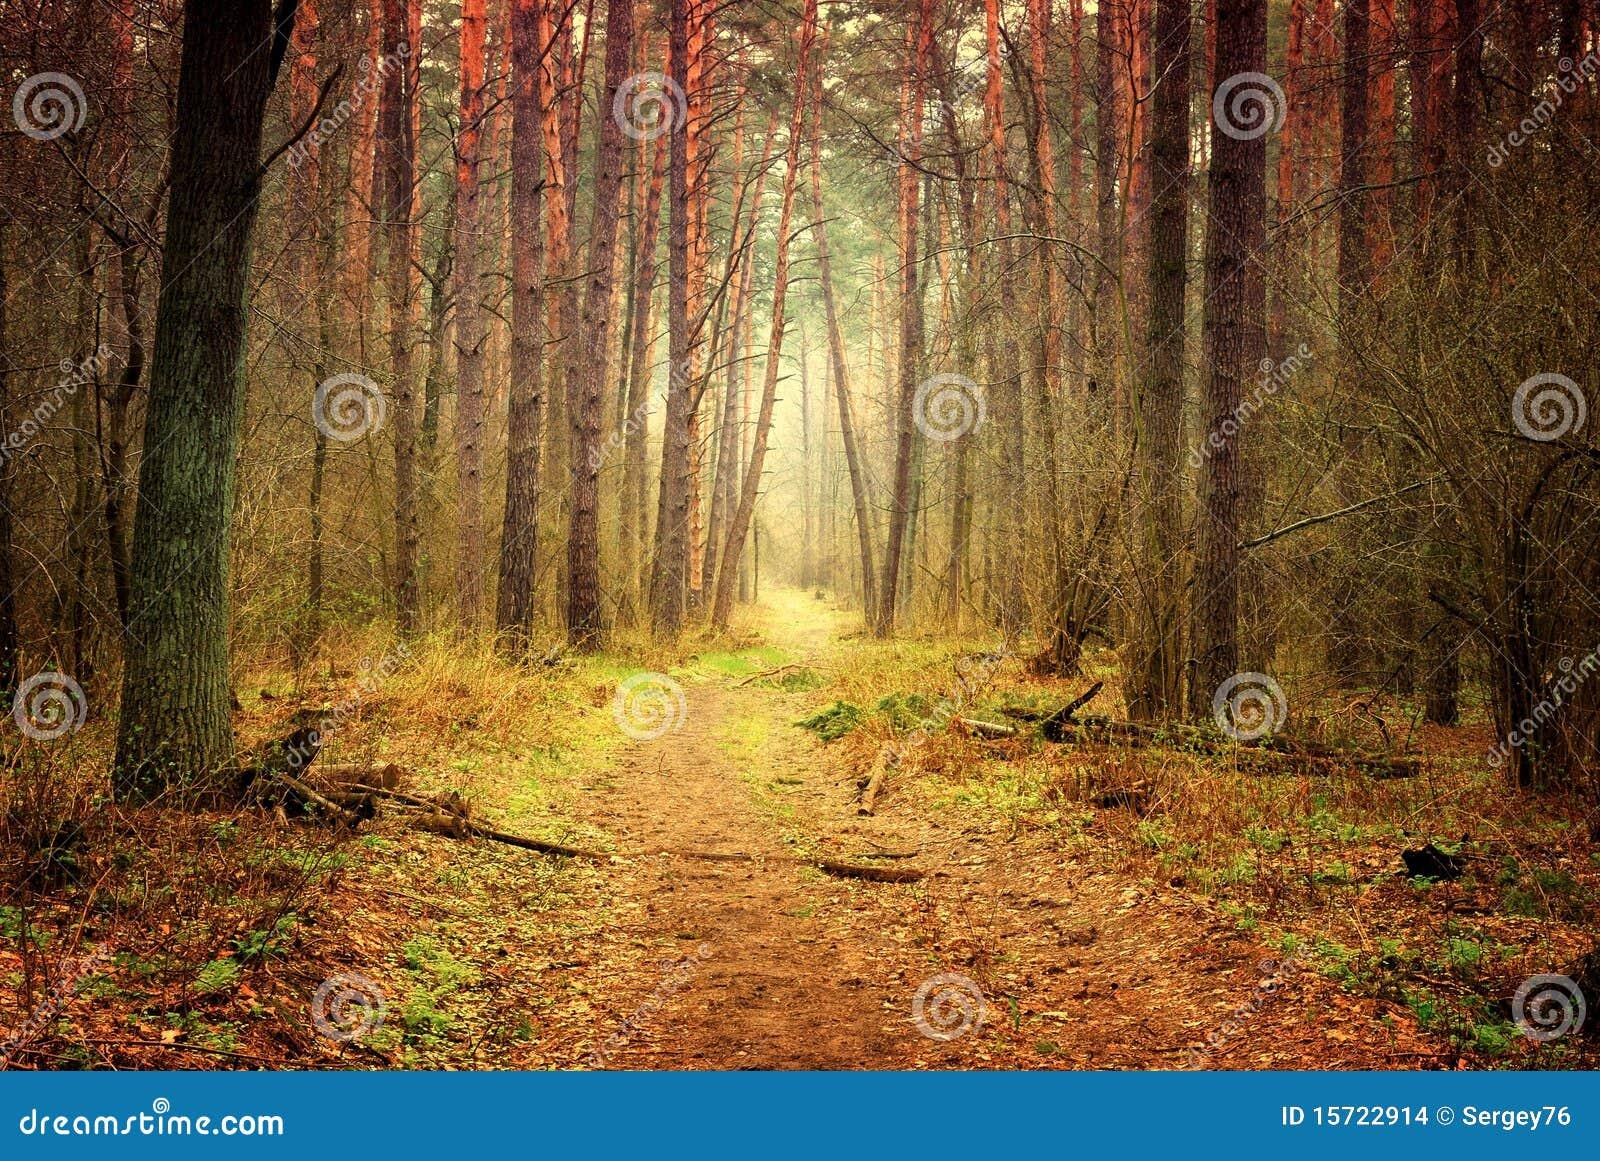 Passeio na floresta místico